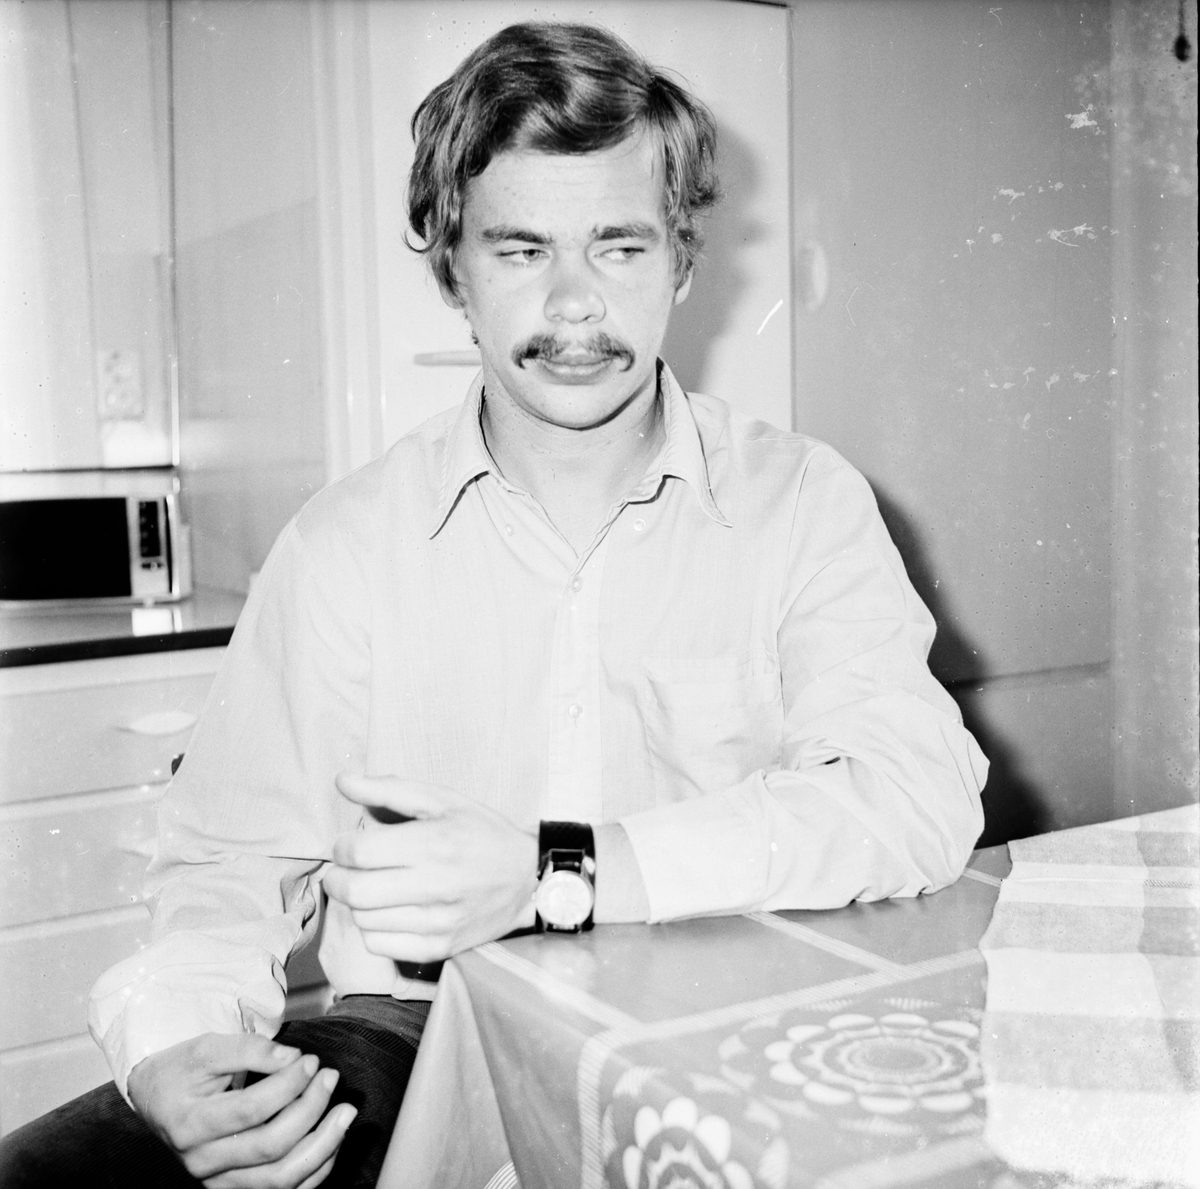 Polisman Bengt-Olov Rottlin. Norrmalmstorgsdramat. Augusti 1973